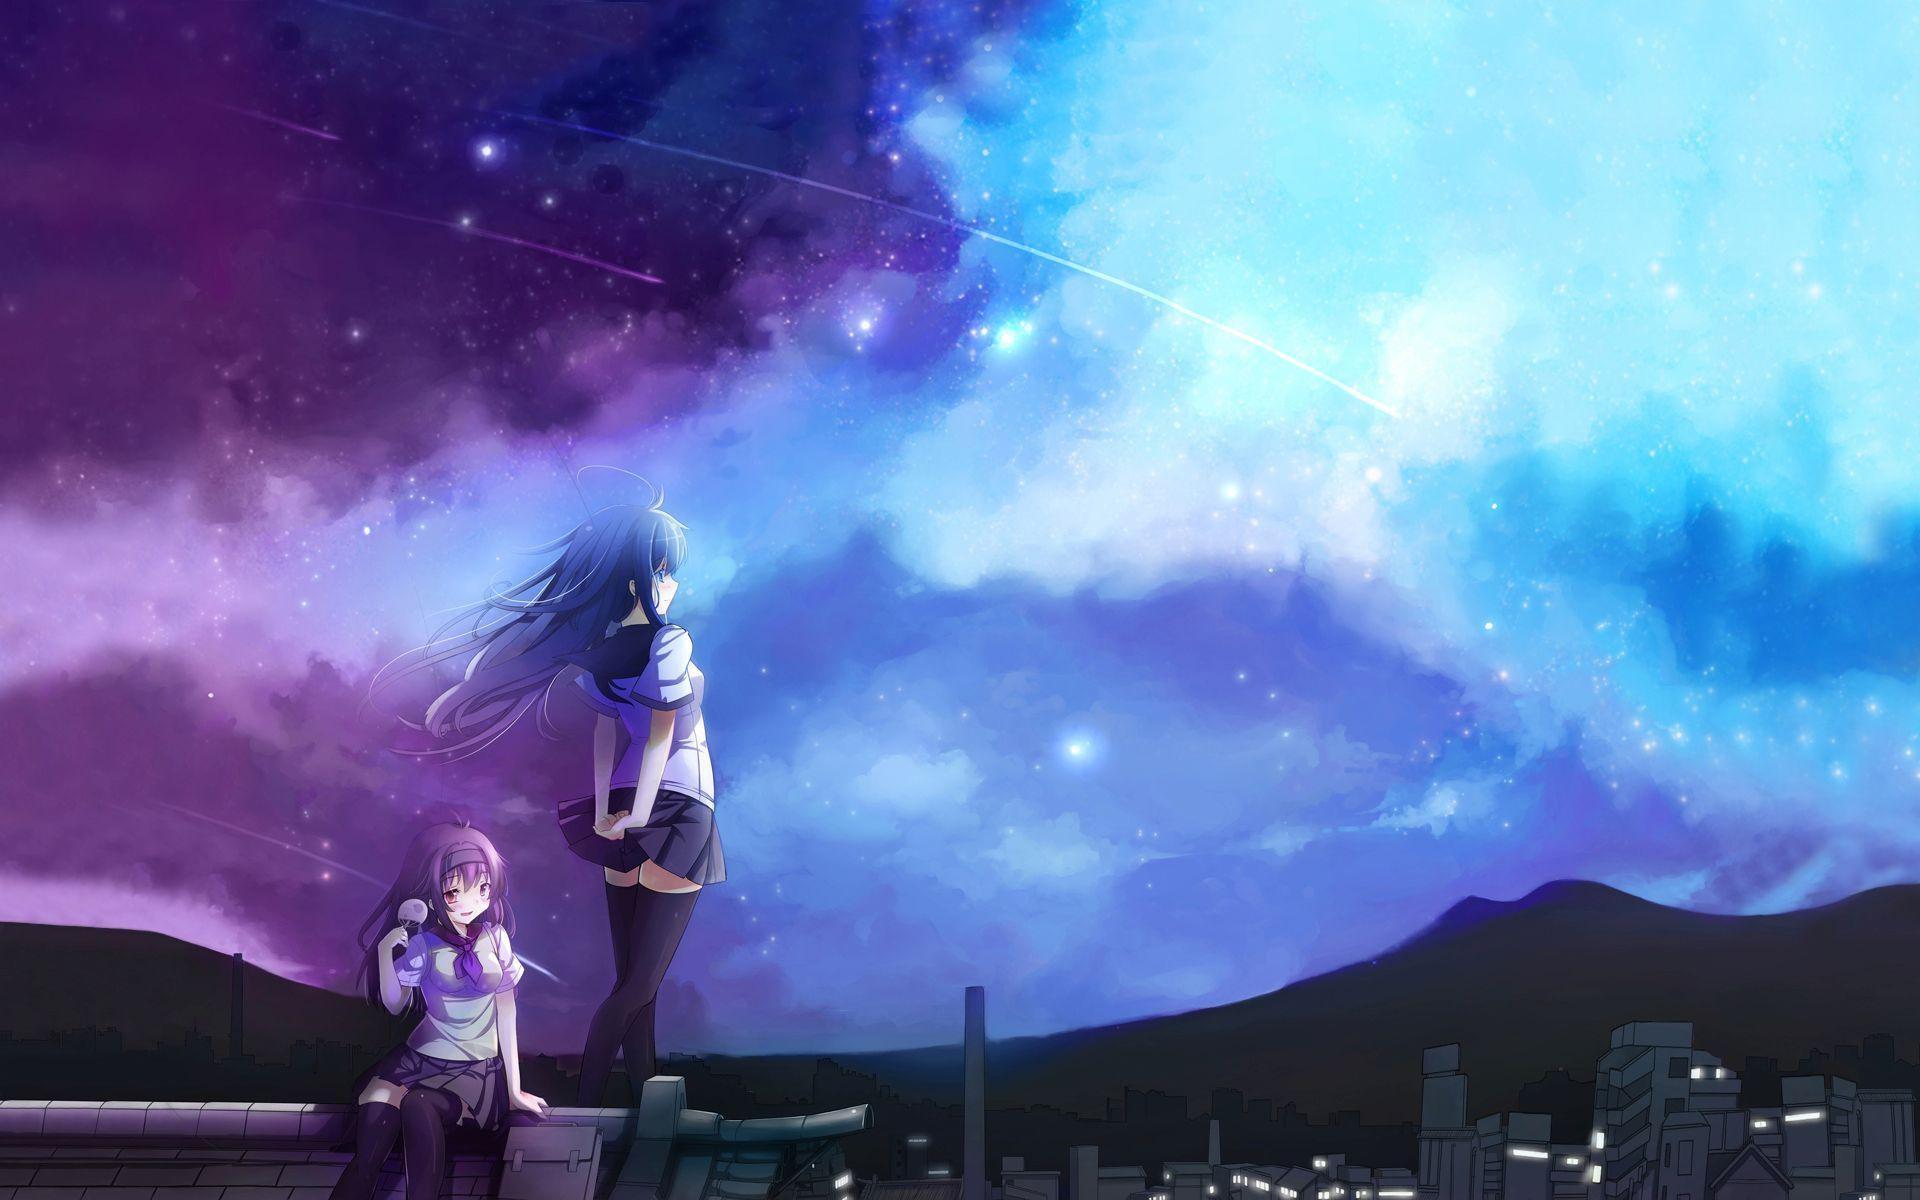 Anime 1920x1200 manga anime girls anime sky purple blue night sky miniskirt cyan